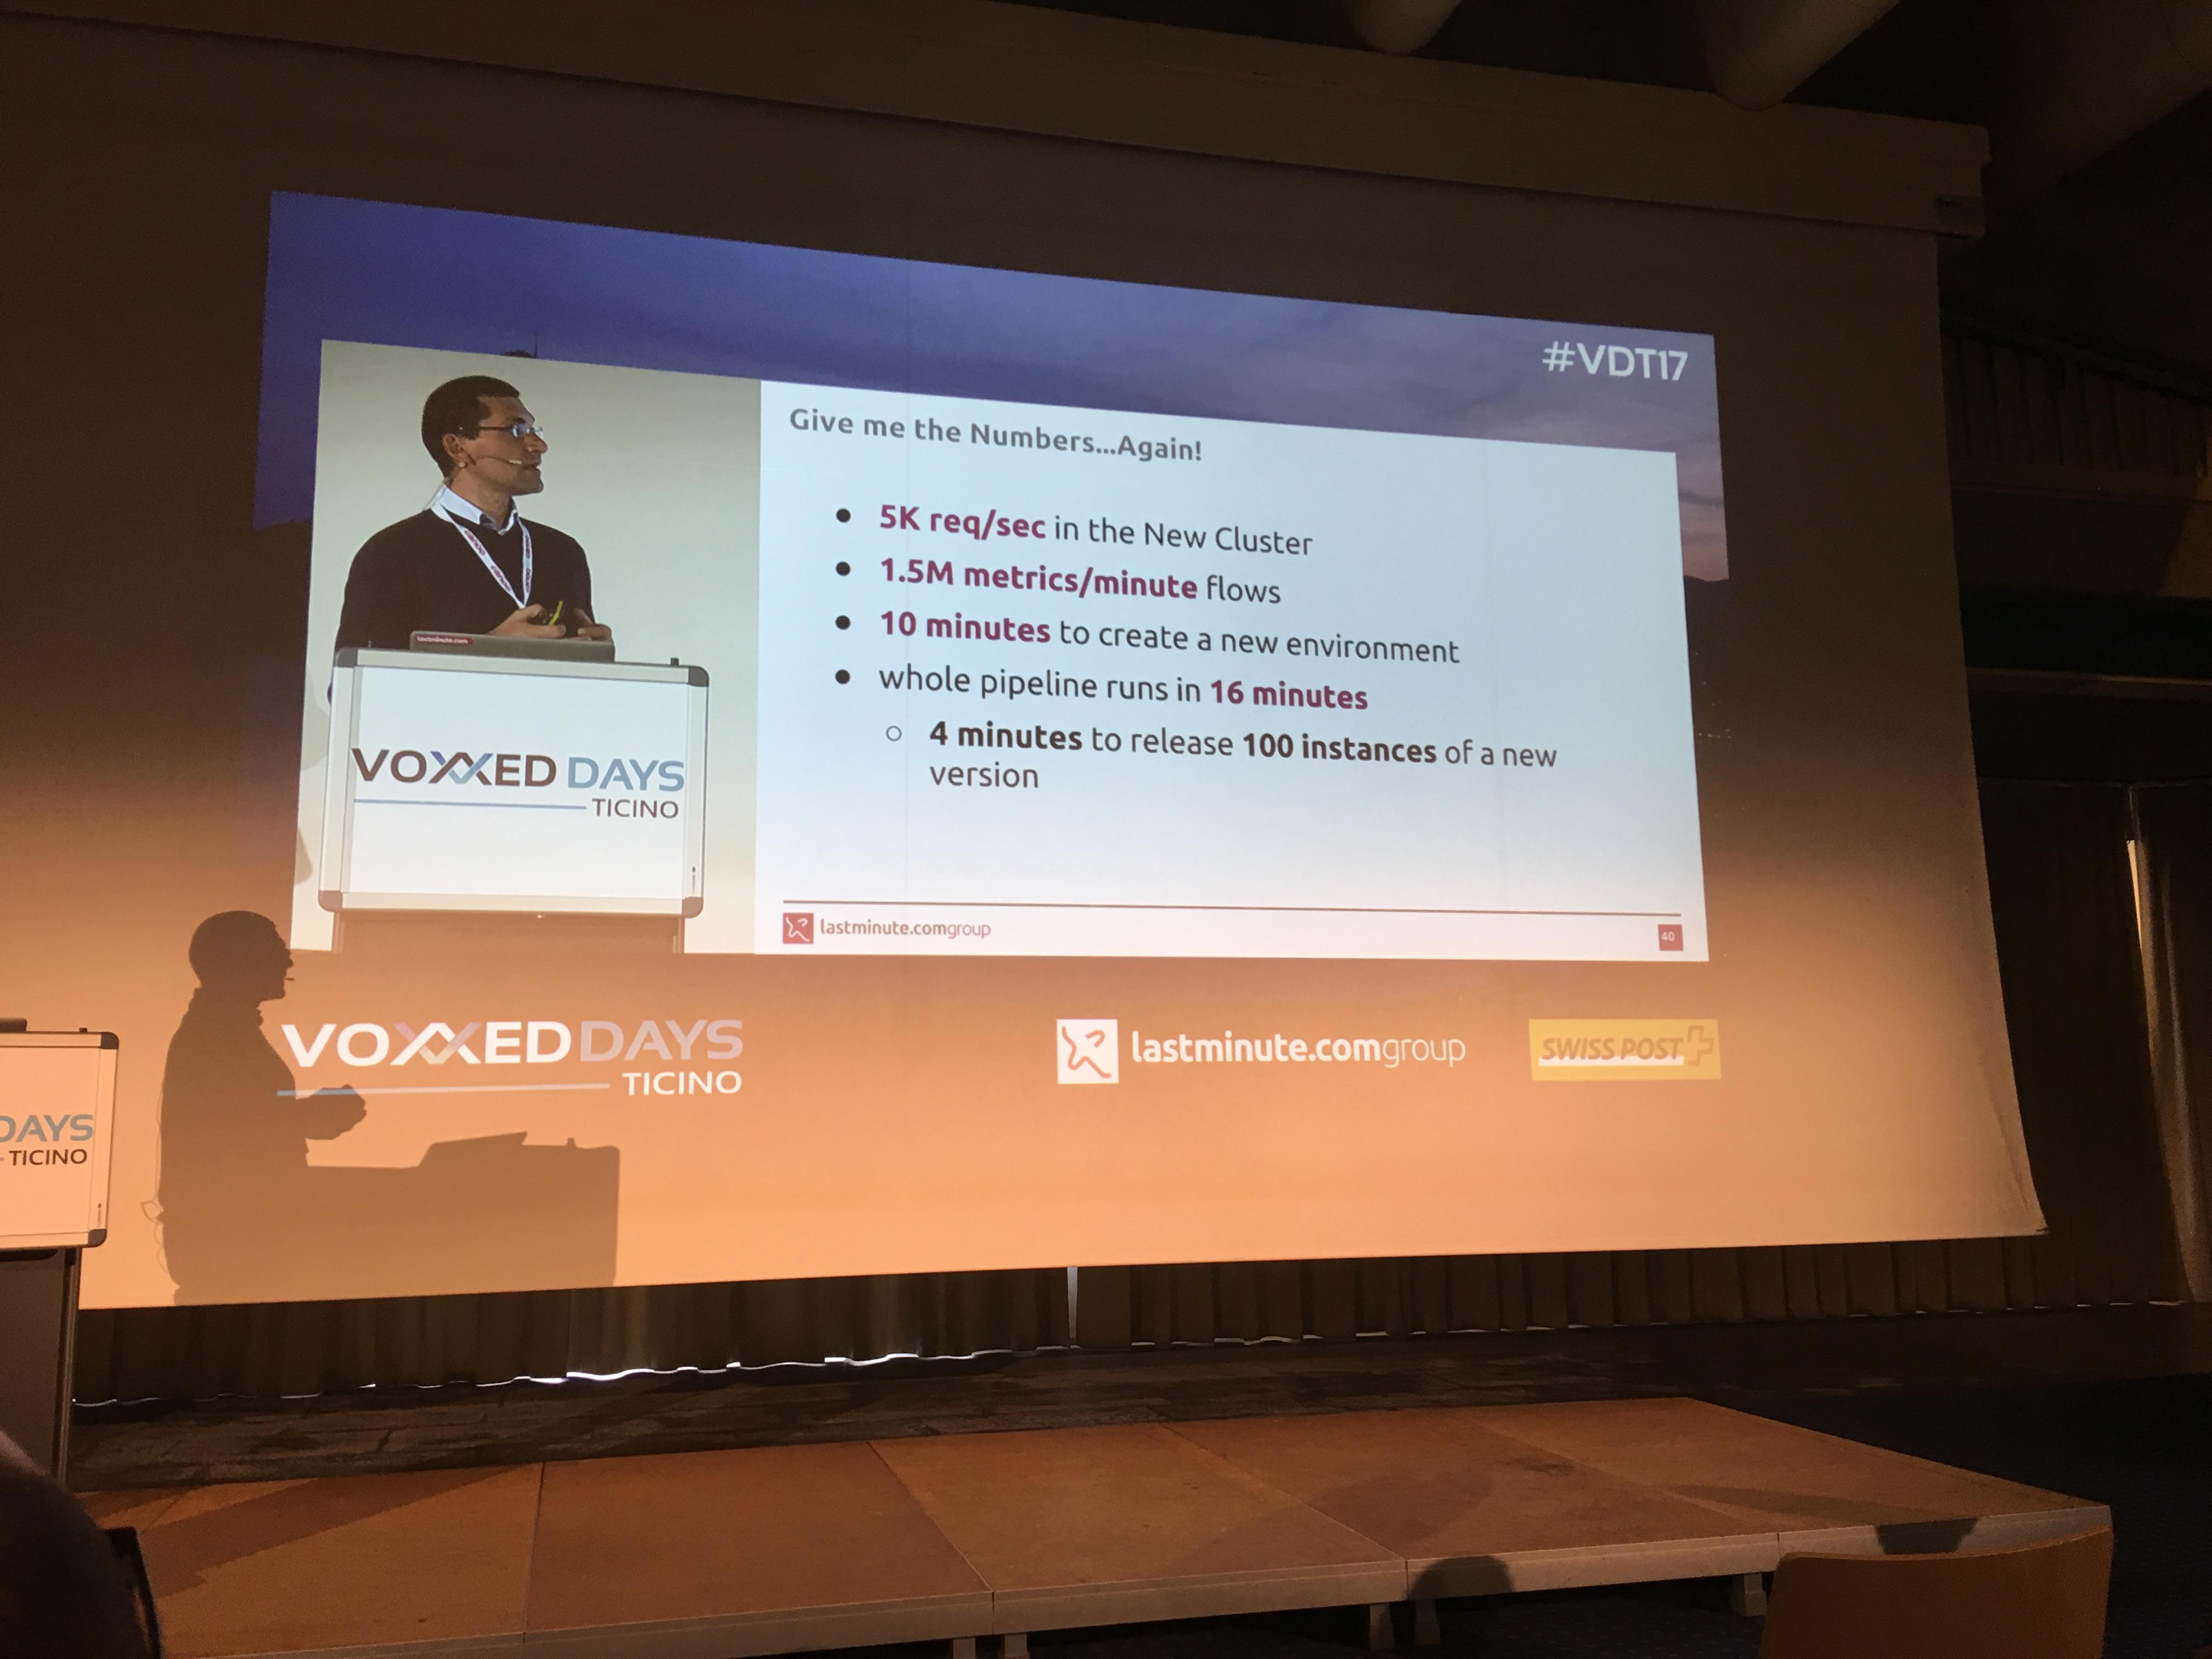 Immagine dal talk su Kubernetes a Voxxed Days Ticino 2017